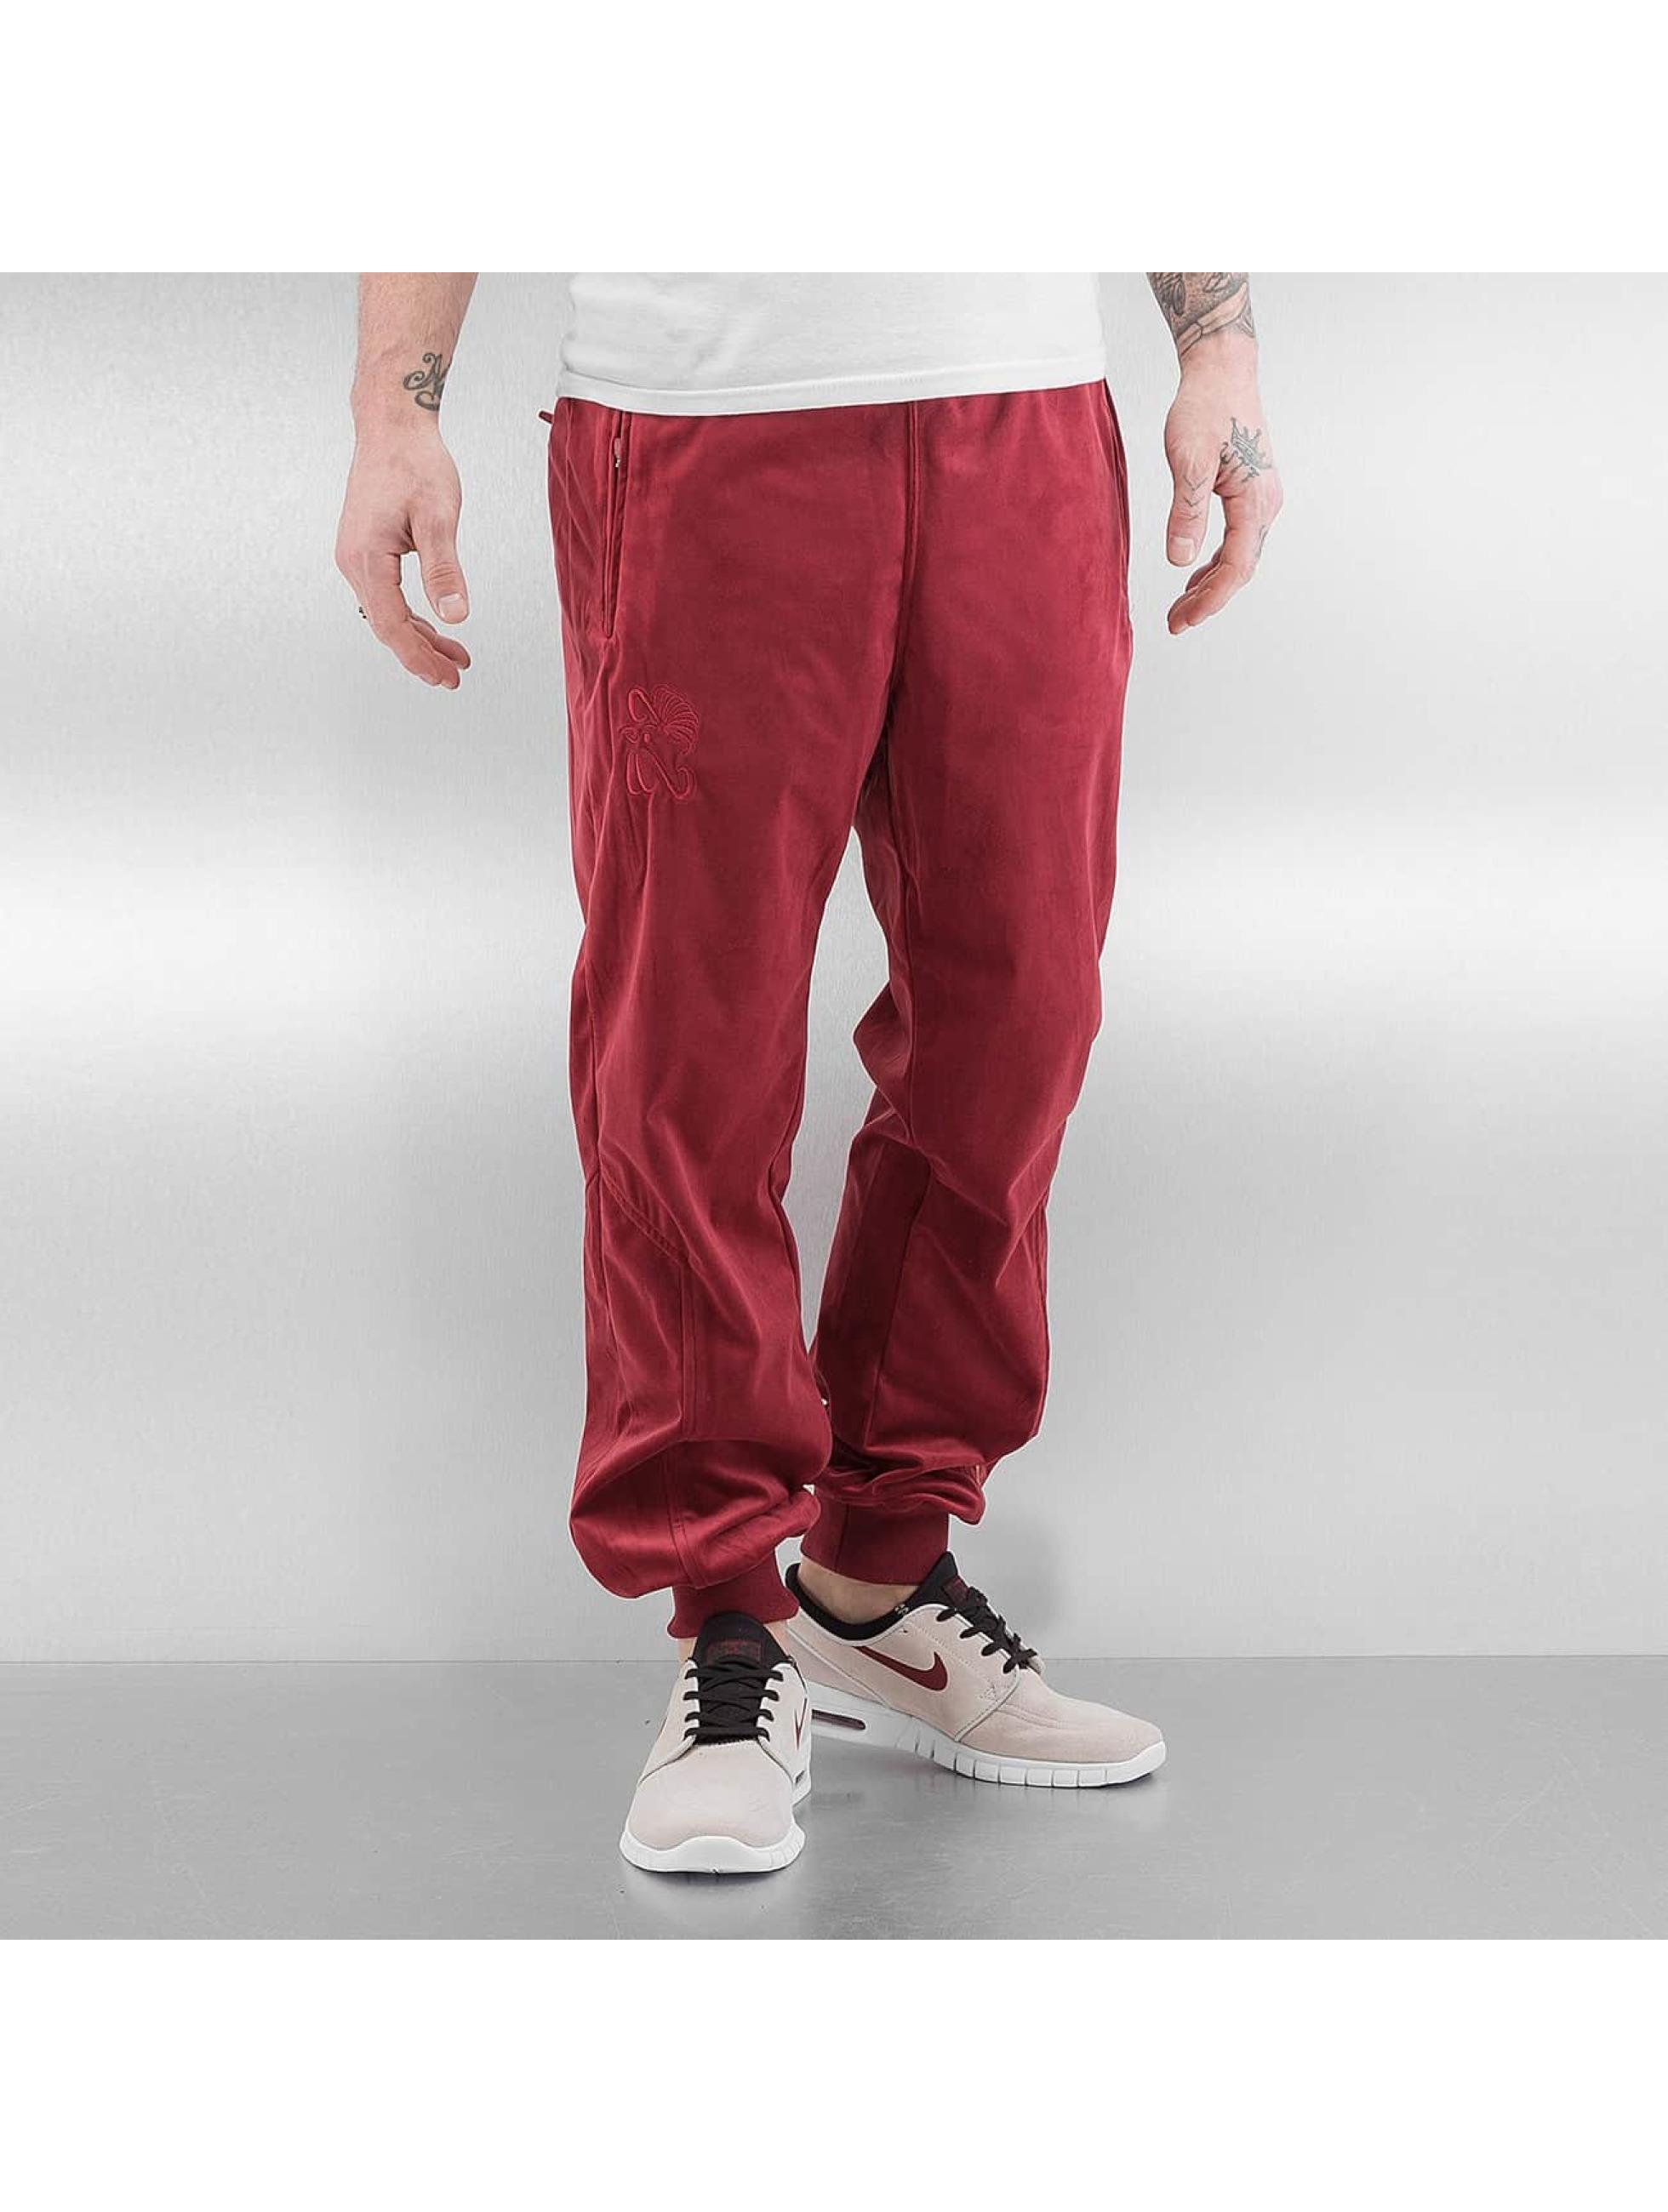 CHABOS IIVII Pantalone ginnico Core Velour Samt rosso